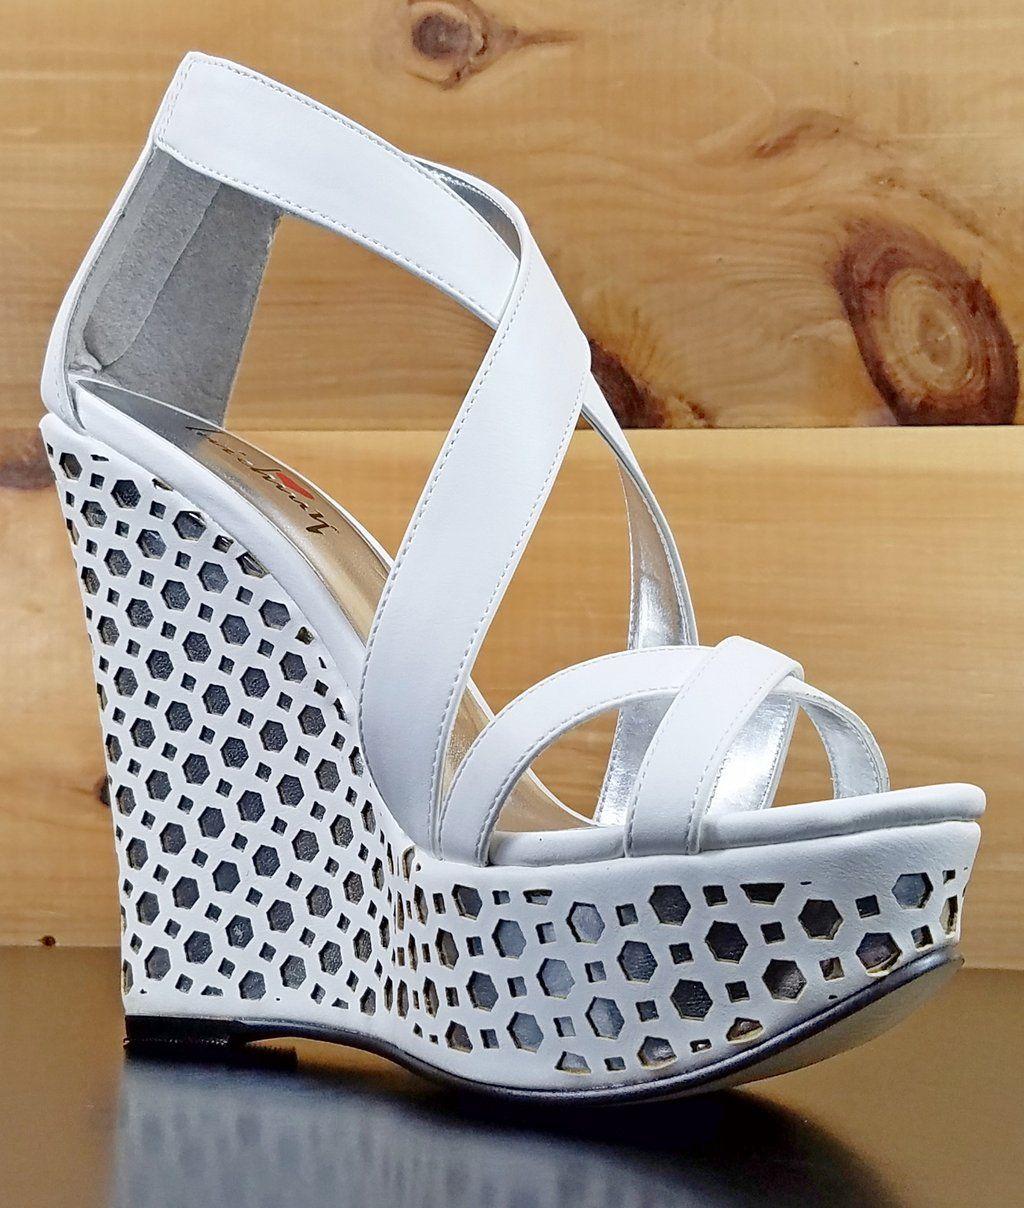 73312a2b955 Luichiny Cor Enna White Silver Wedge Sandal Shoe 5